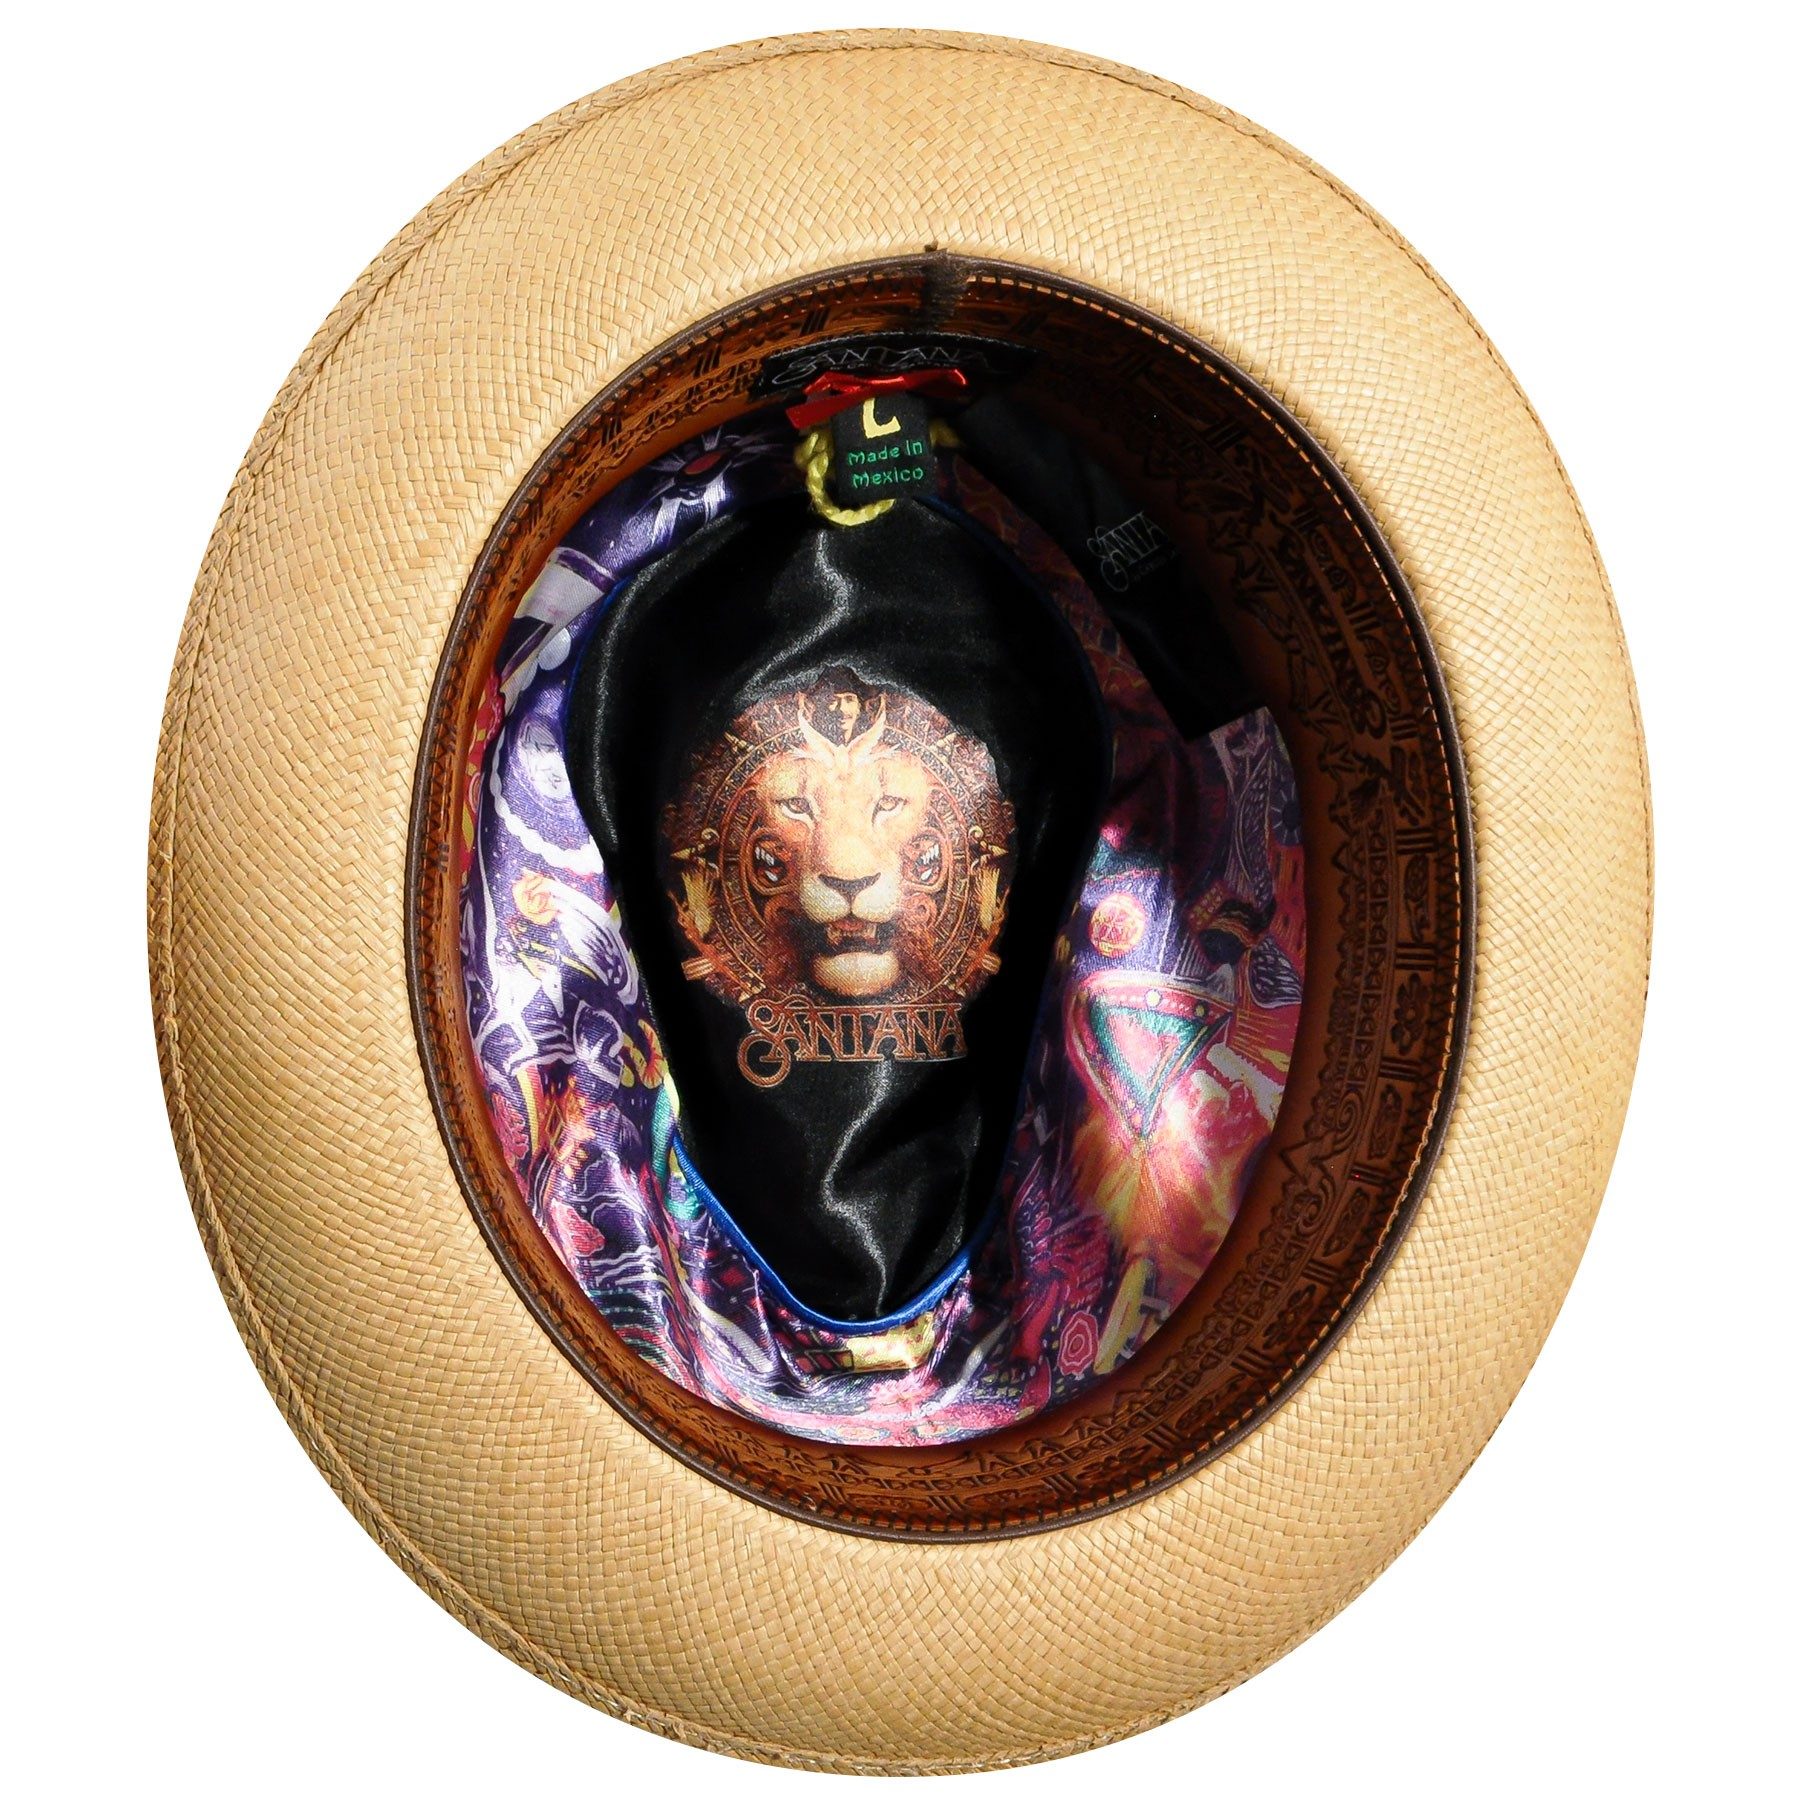 eb852317f2617 Santana - Carlos Headwear Sacred Fire Panama Hat W Heart Logo   Pin Size  Small - Walmart.com